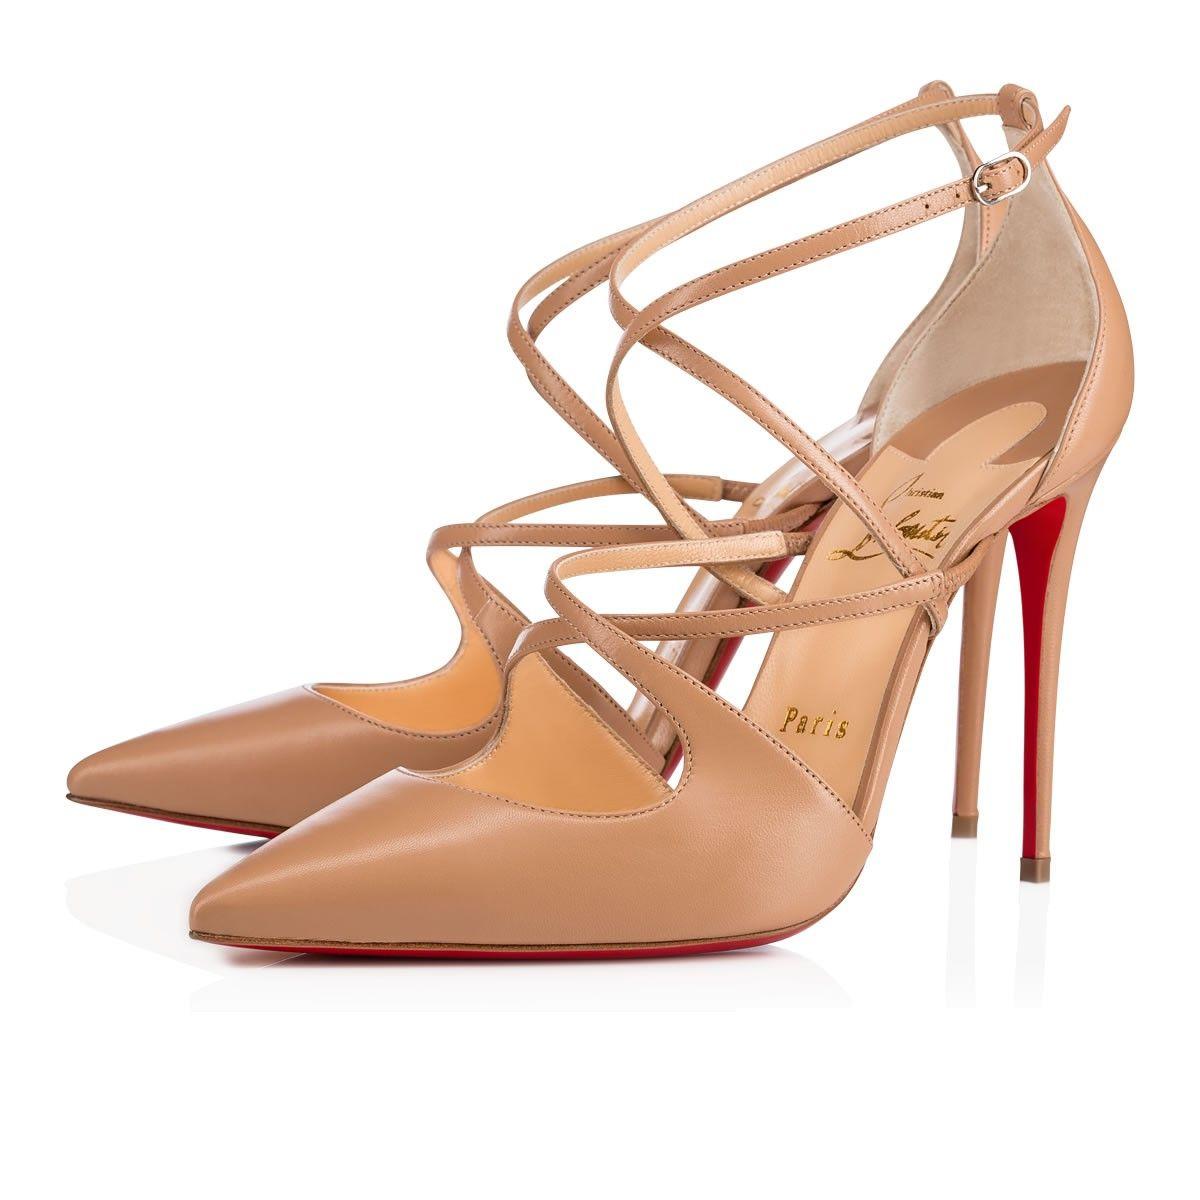 974ec8c9559e Crossfliketa 100 Nude Leather - Women Shoes - Christian Louboutin ...